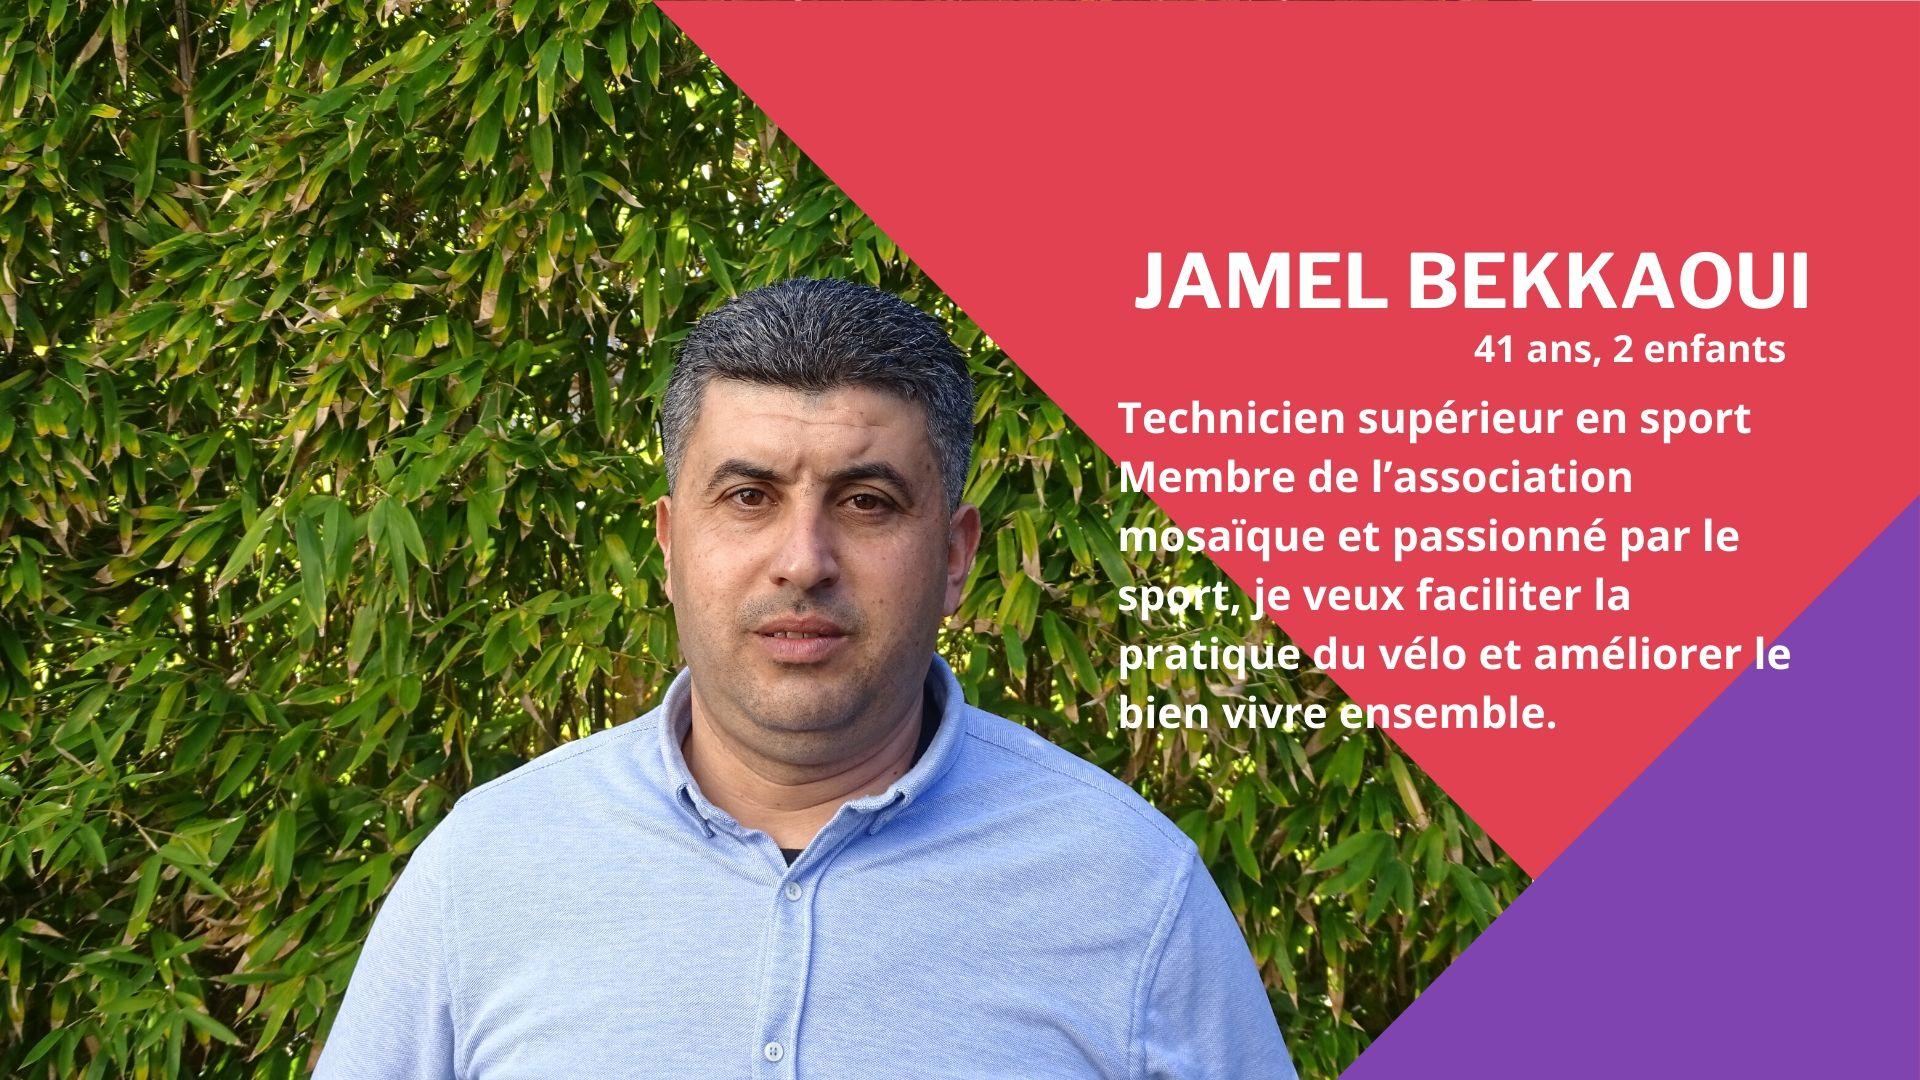 Le Revivre - Jamel Bekkaoui